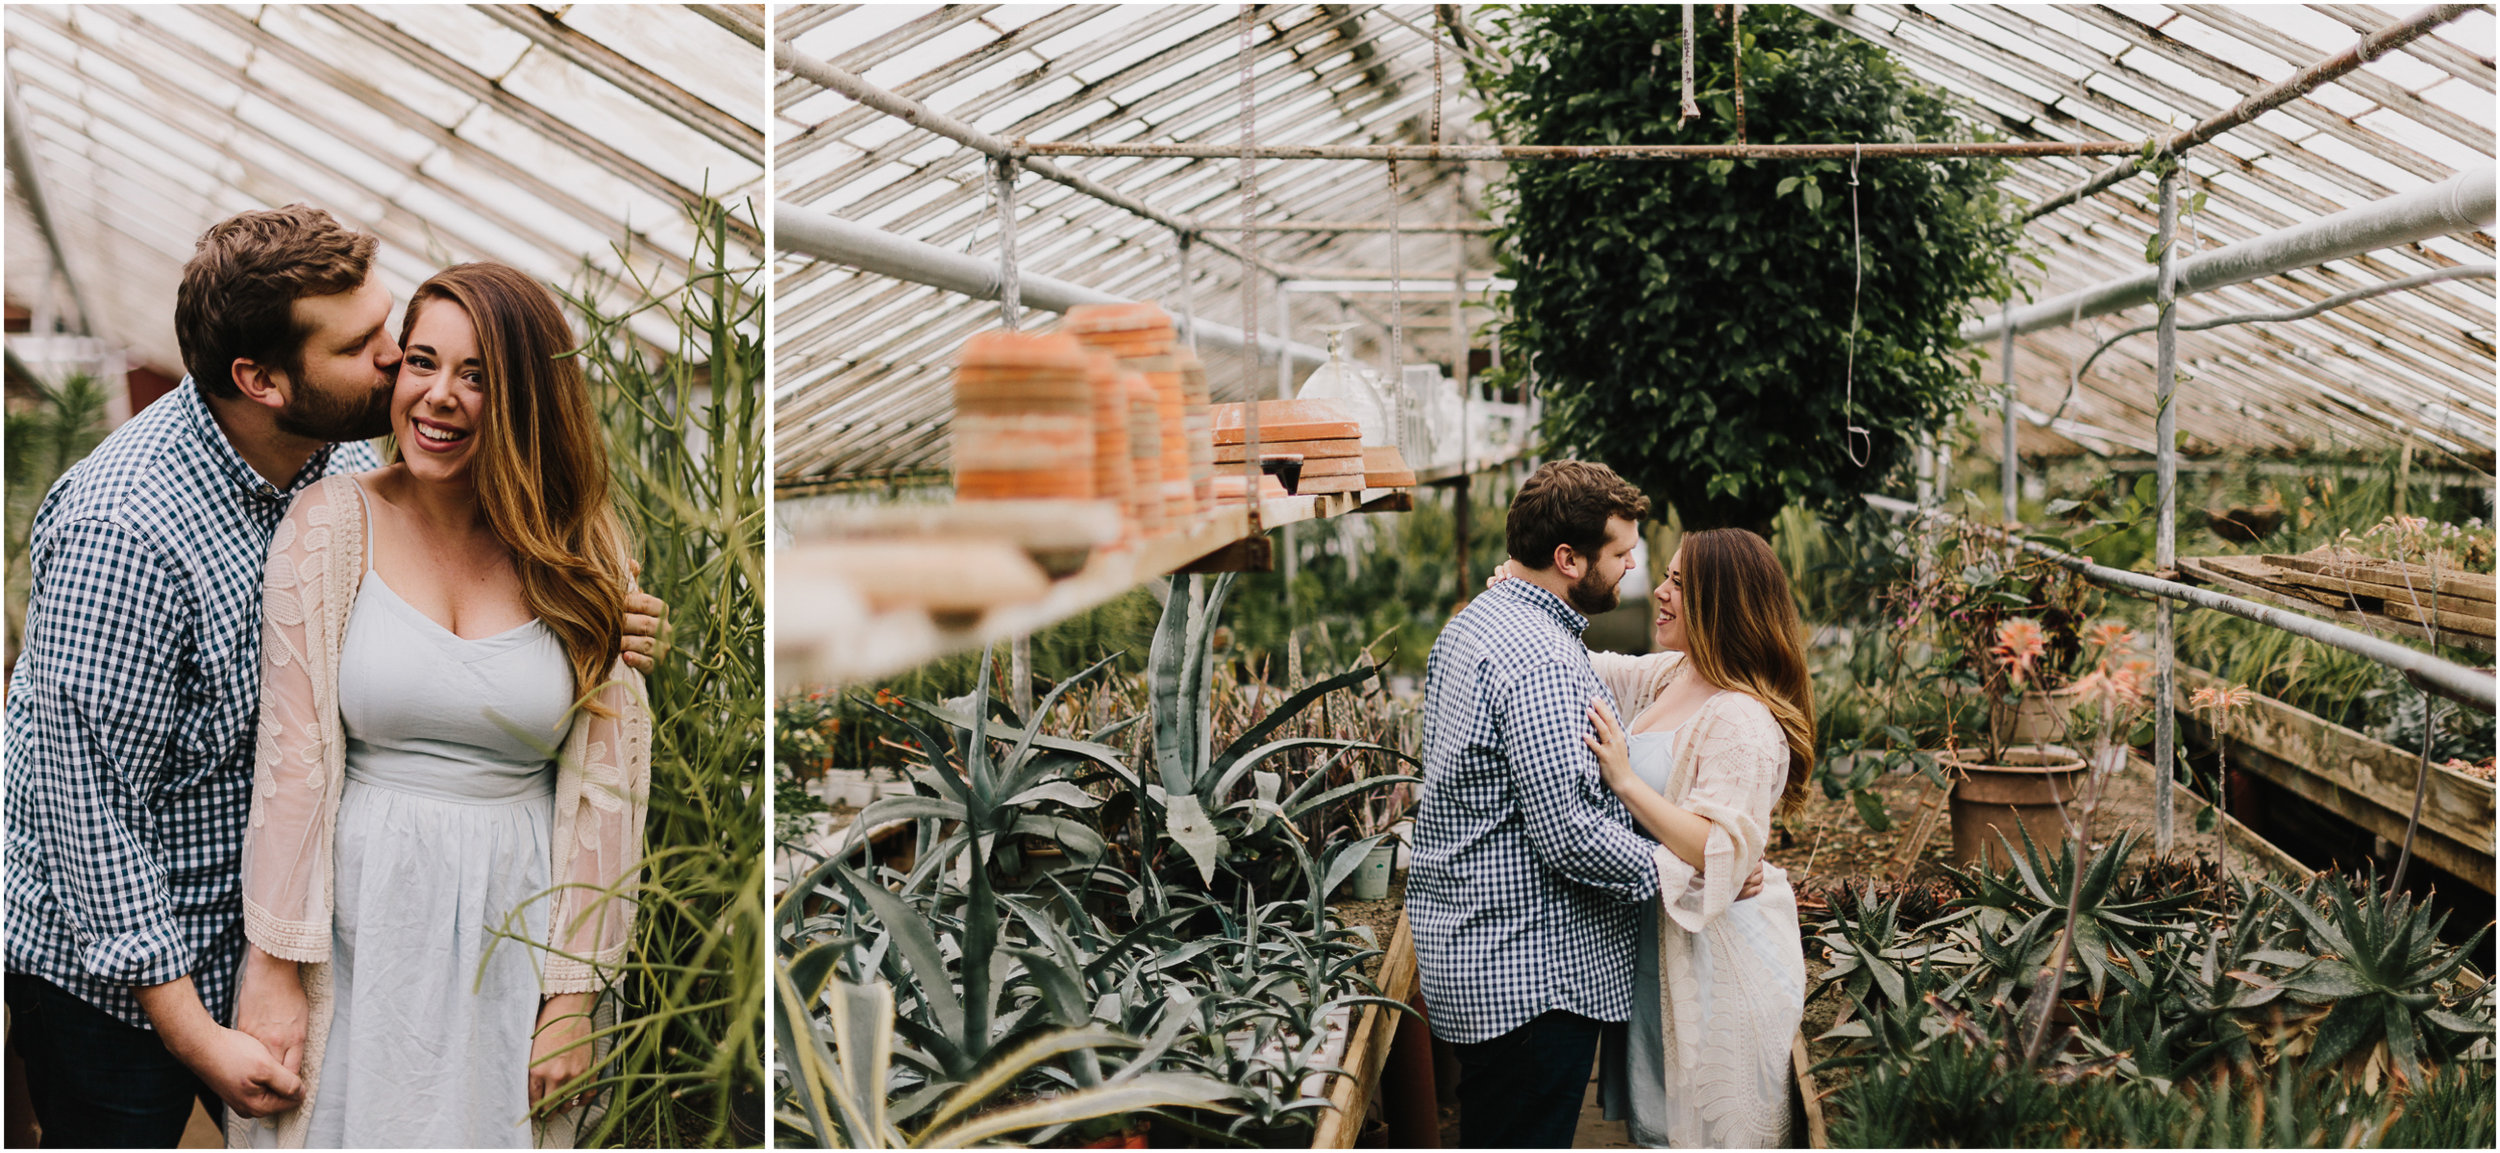 alyssa barletter photography greenhouse engagement photographer kansas city spring wedding-5.jpg